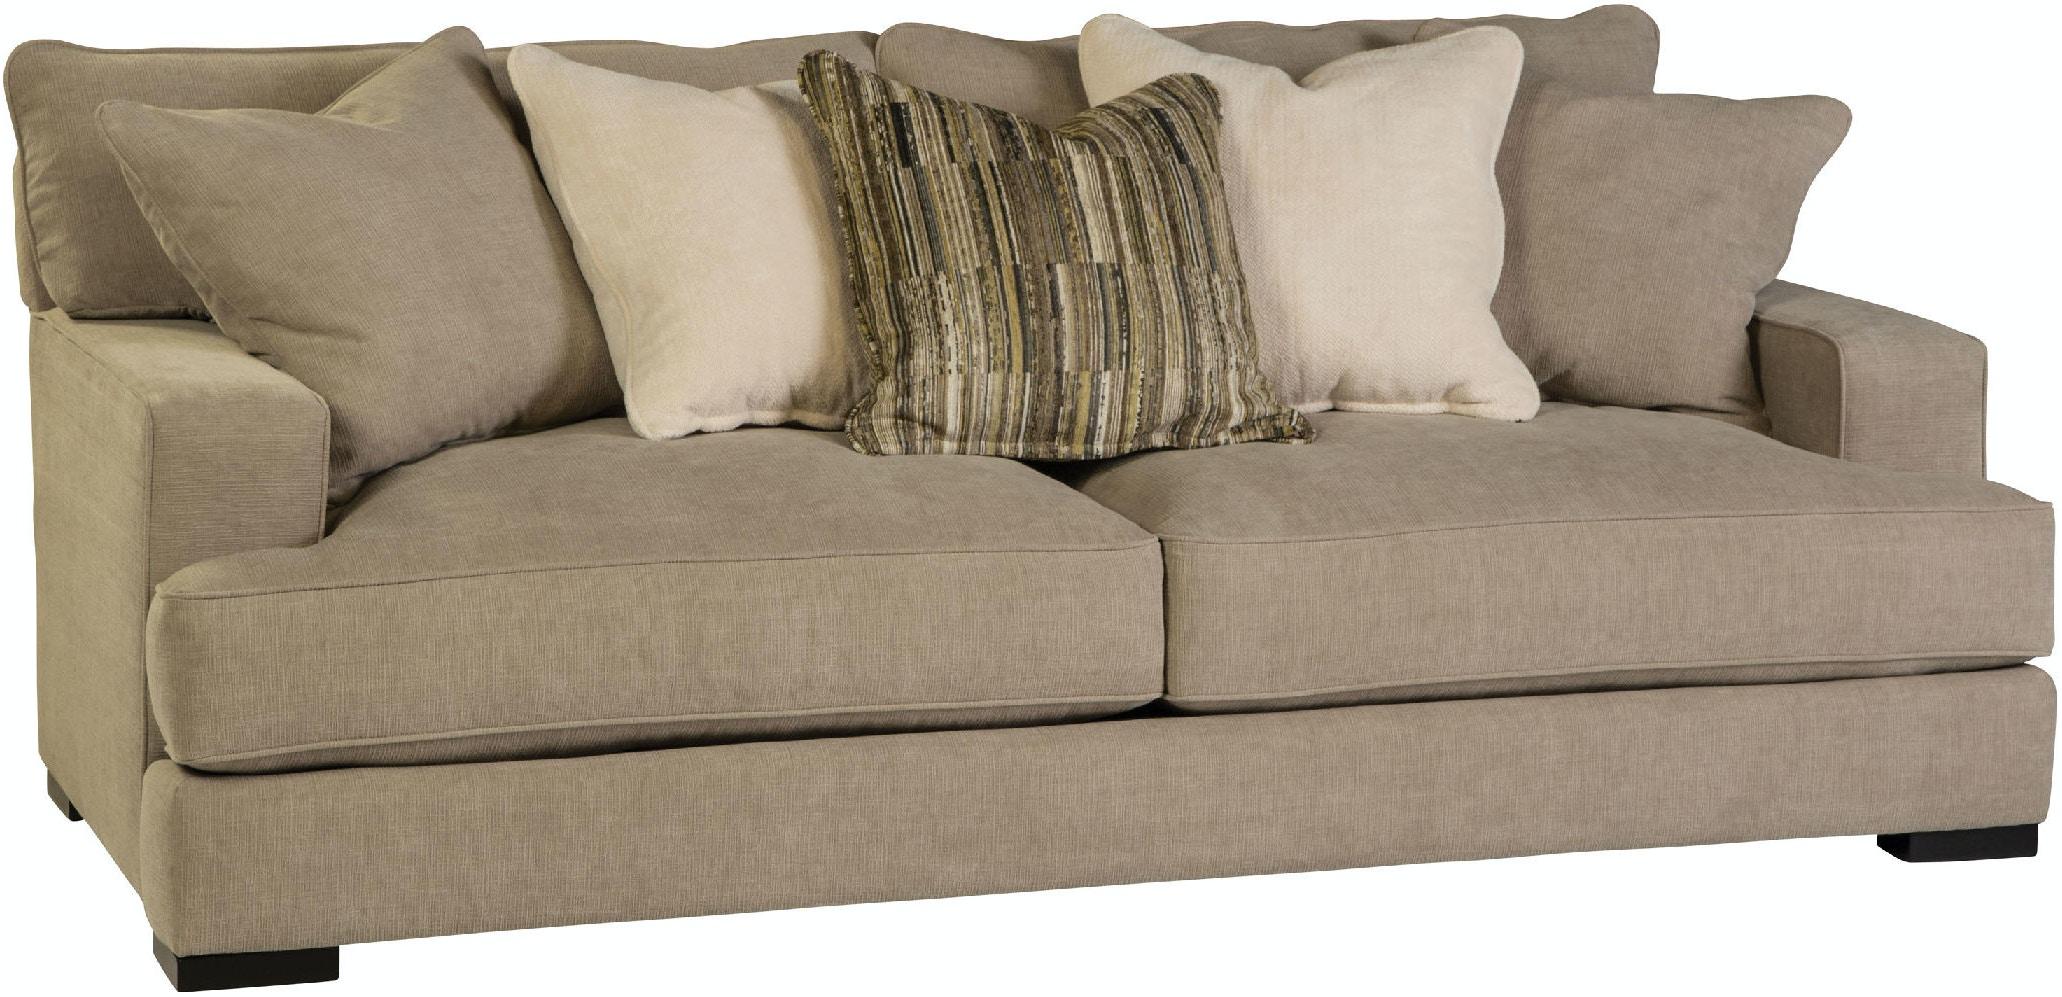 Jonathan Louis International Living Room Sofa 24630